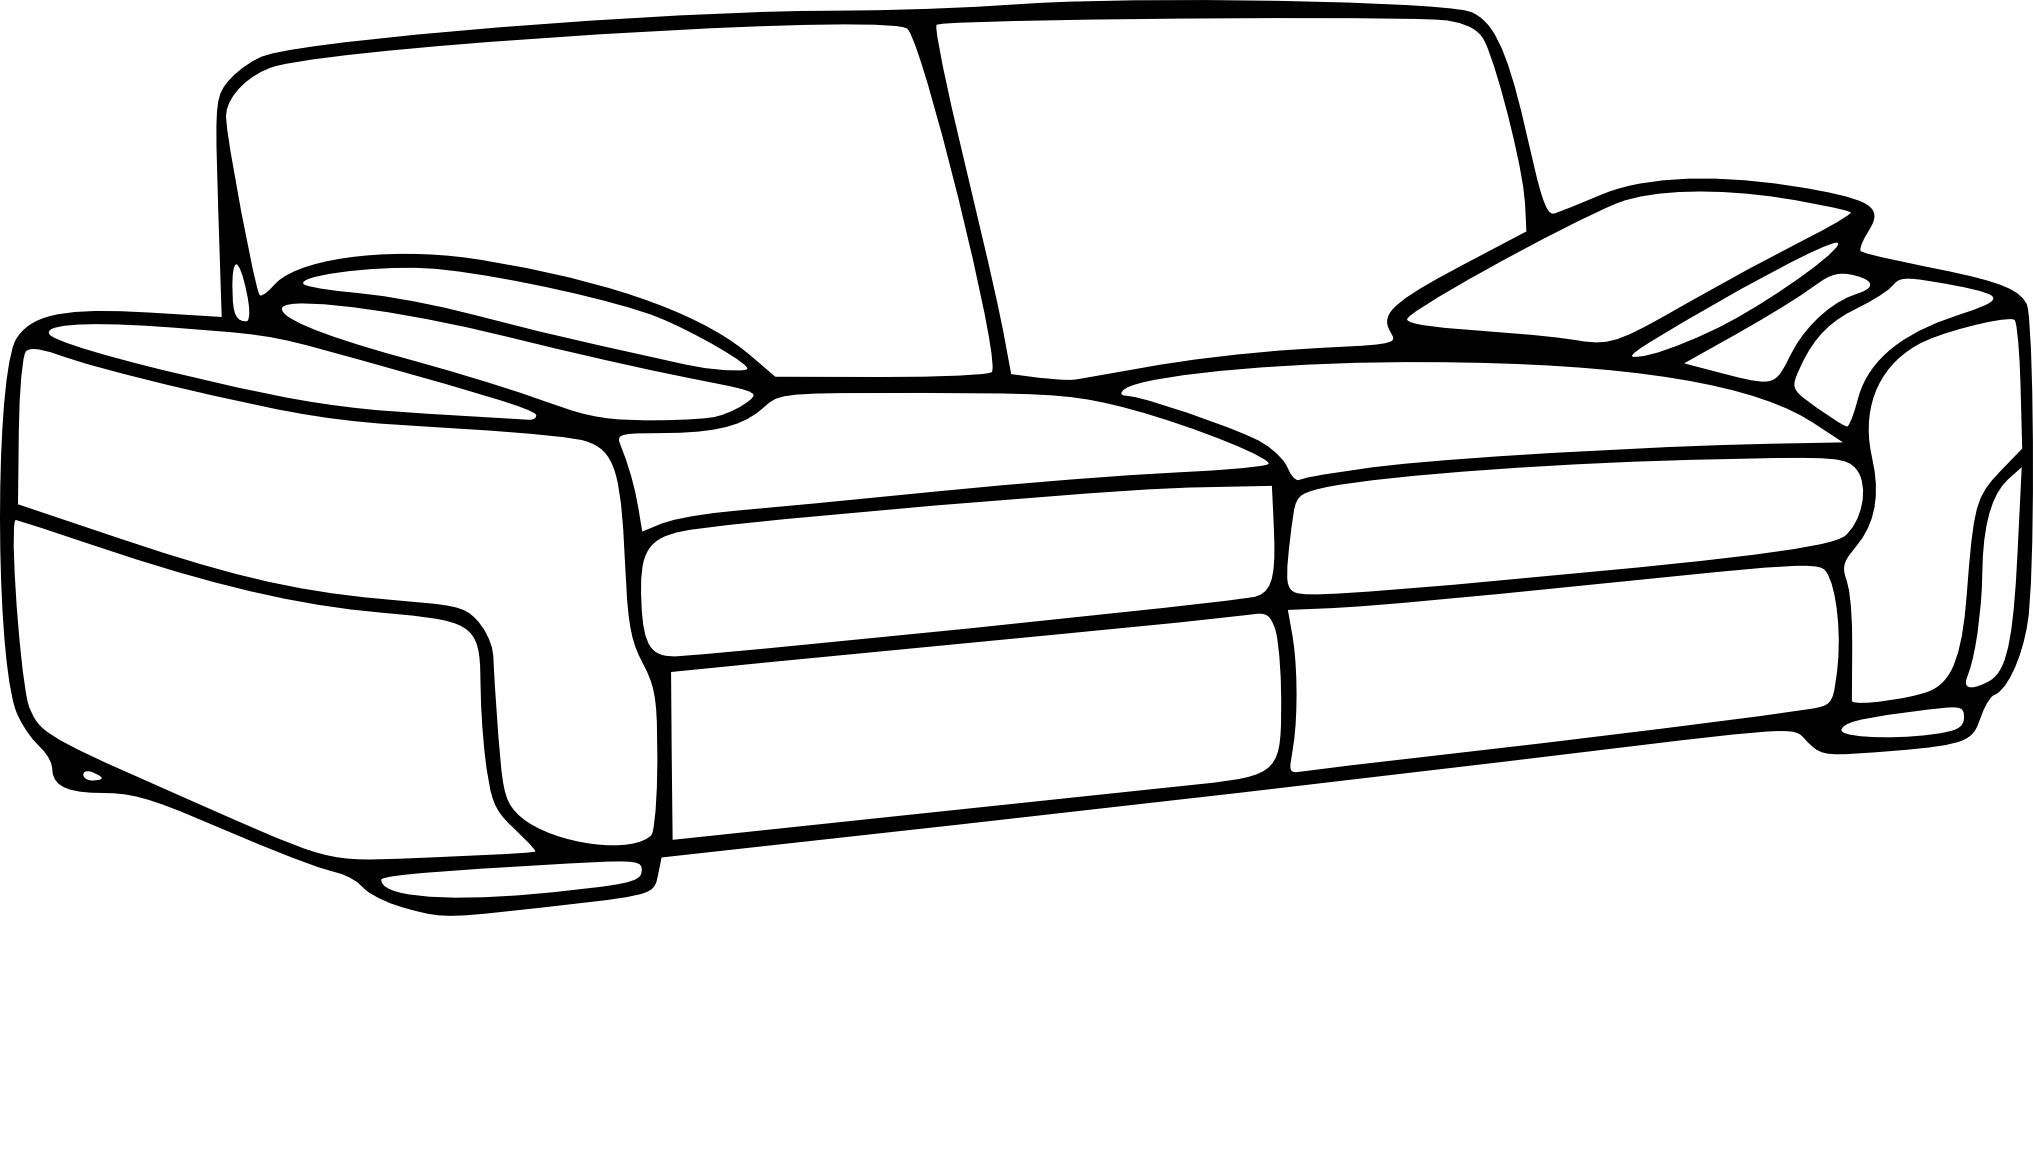 canapé dessin